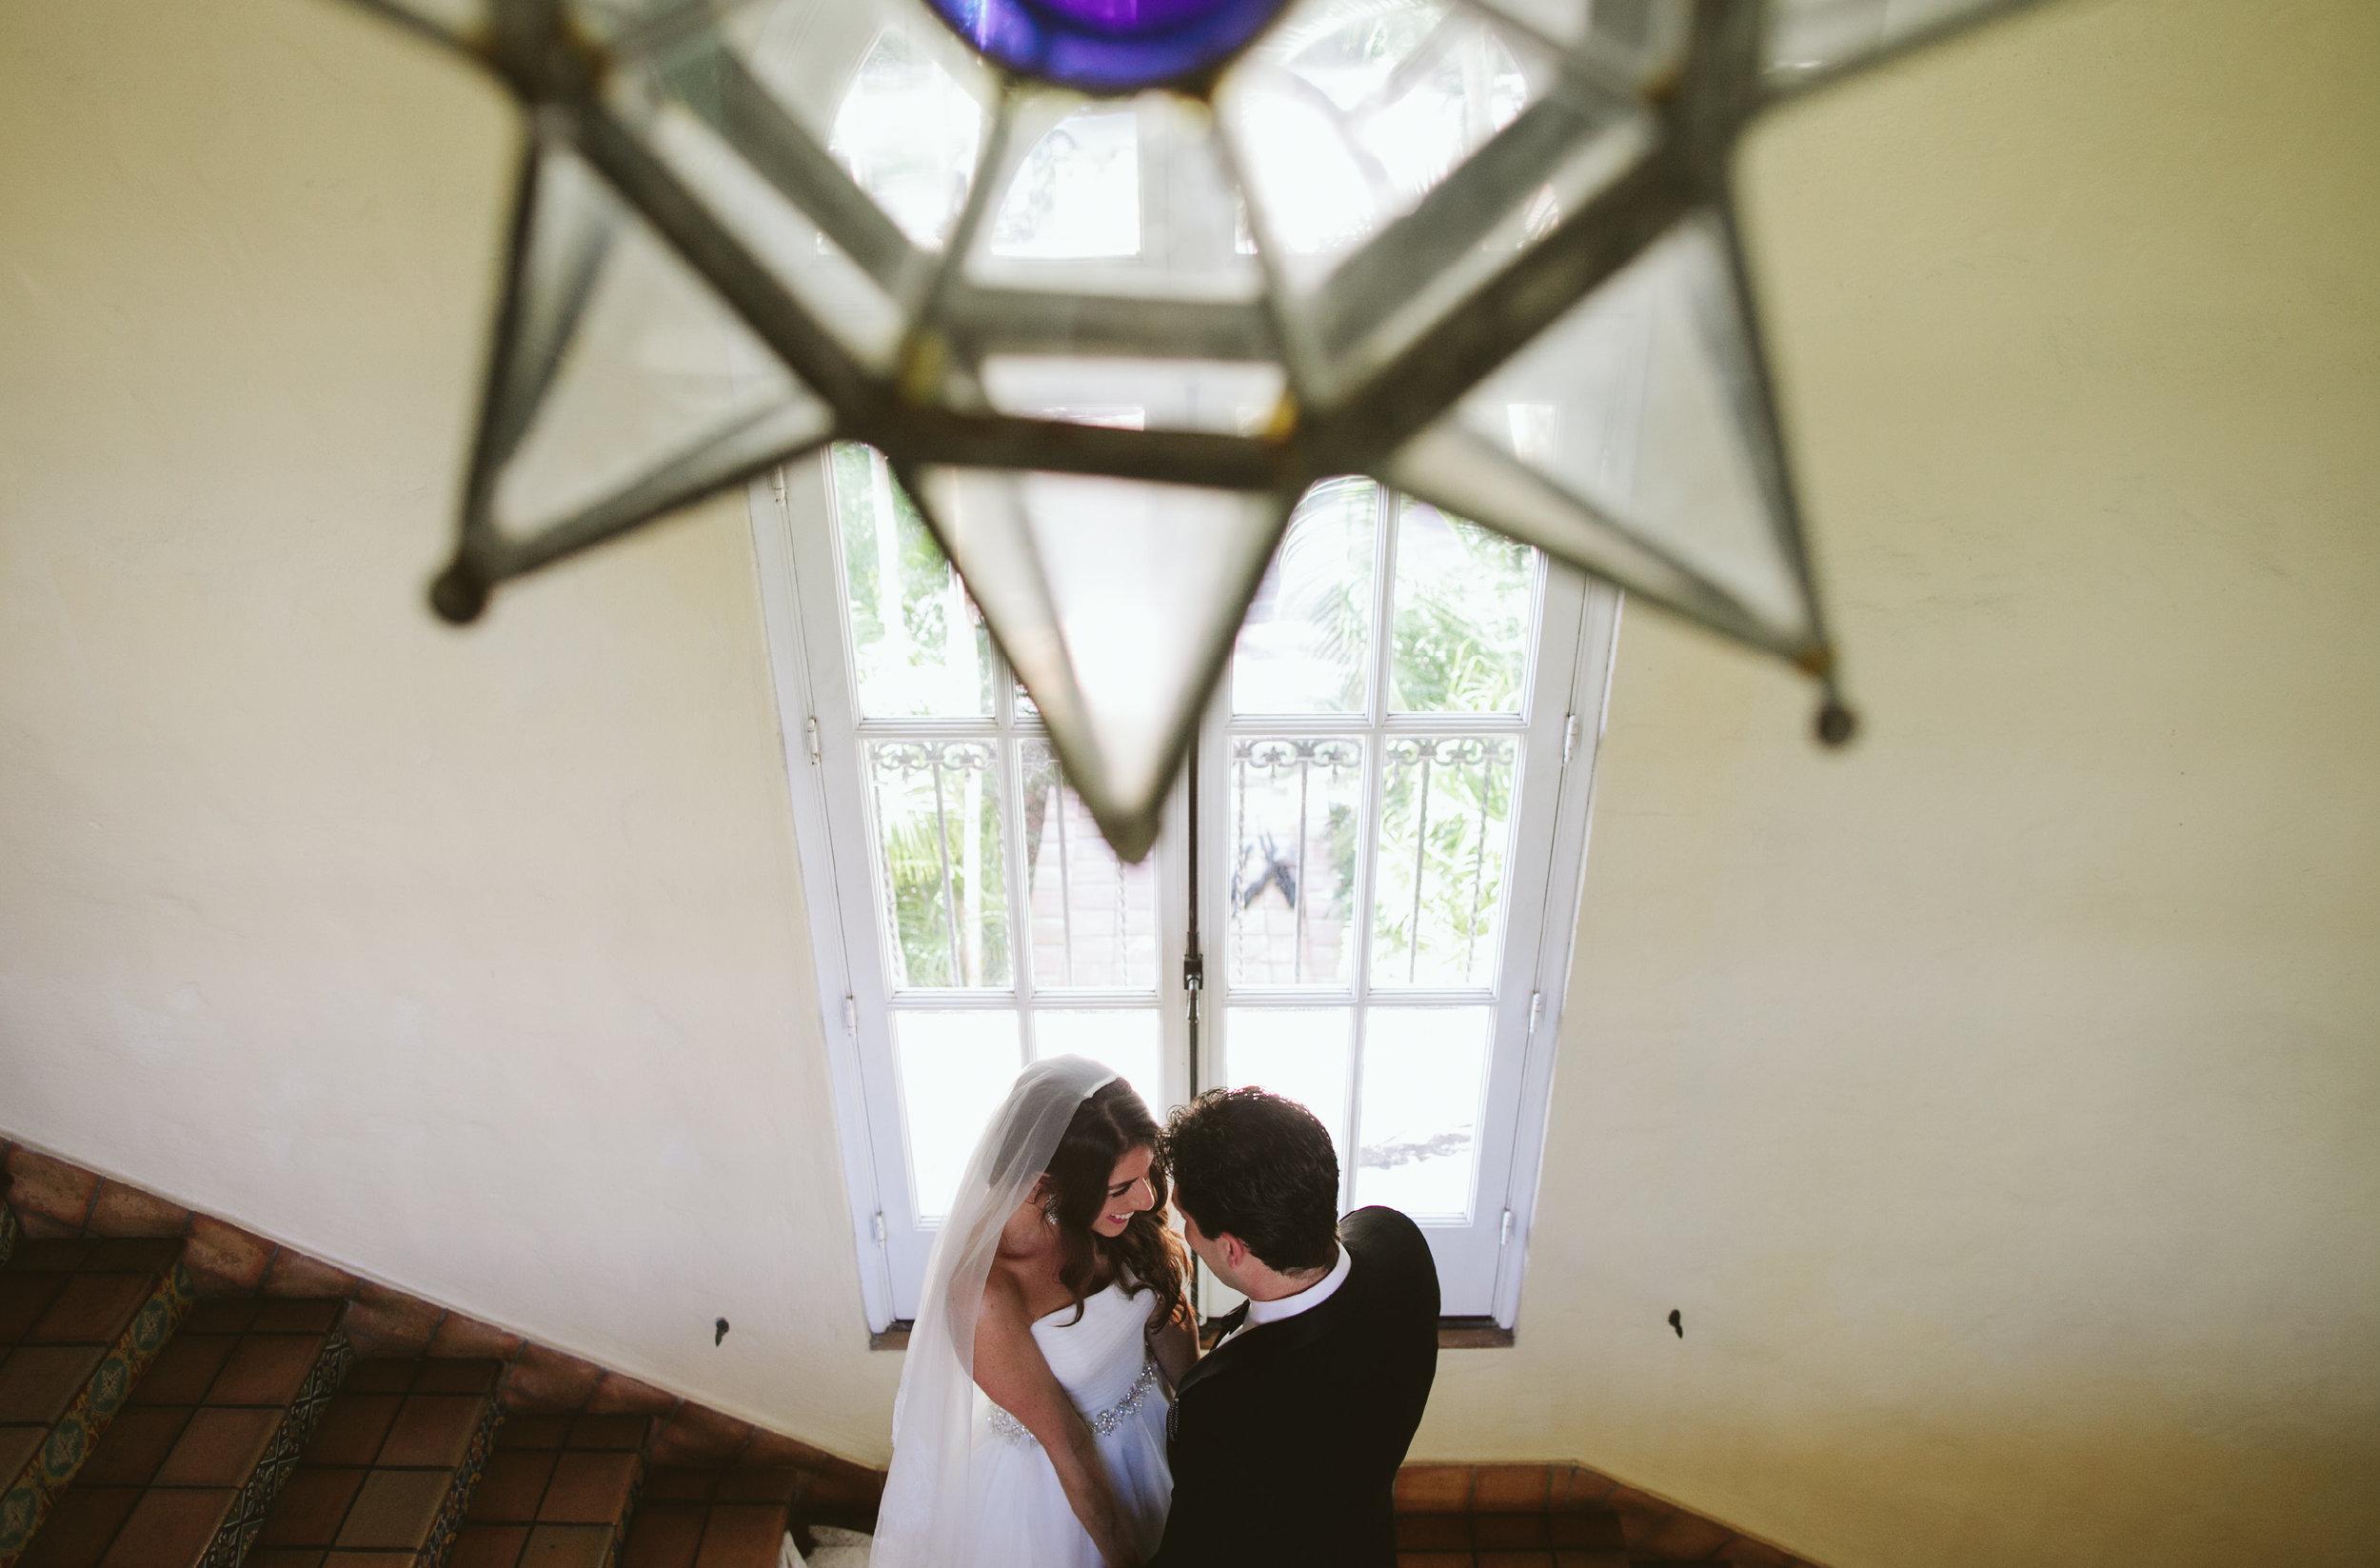 Meli + Mike Coconut Grove Wedding at Villa Woodbine30.jpg